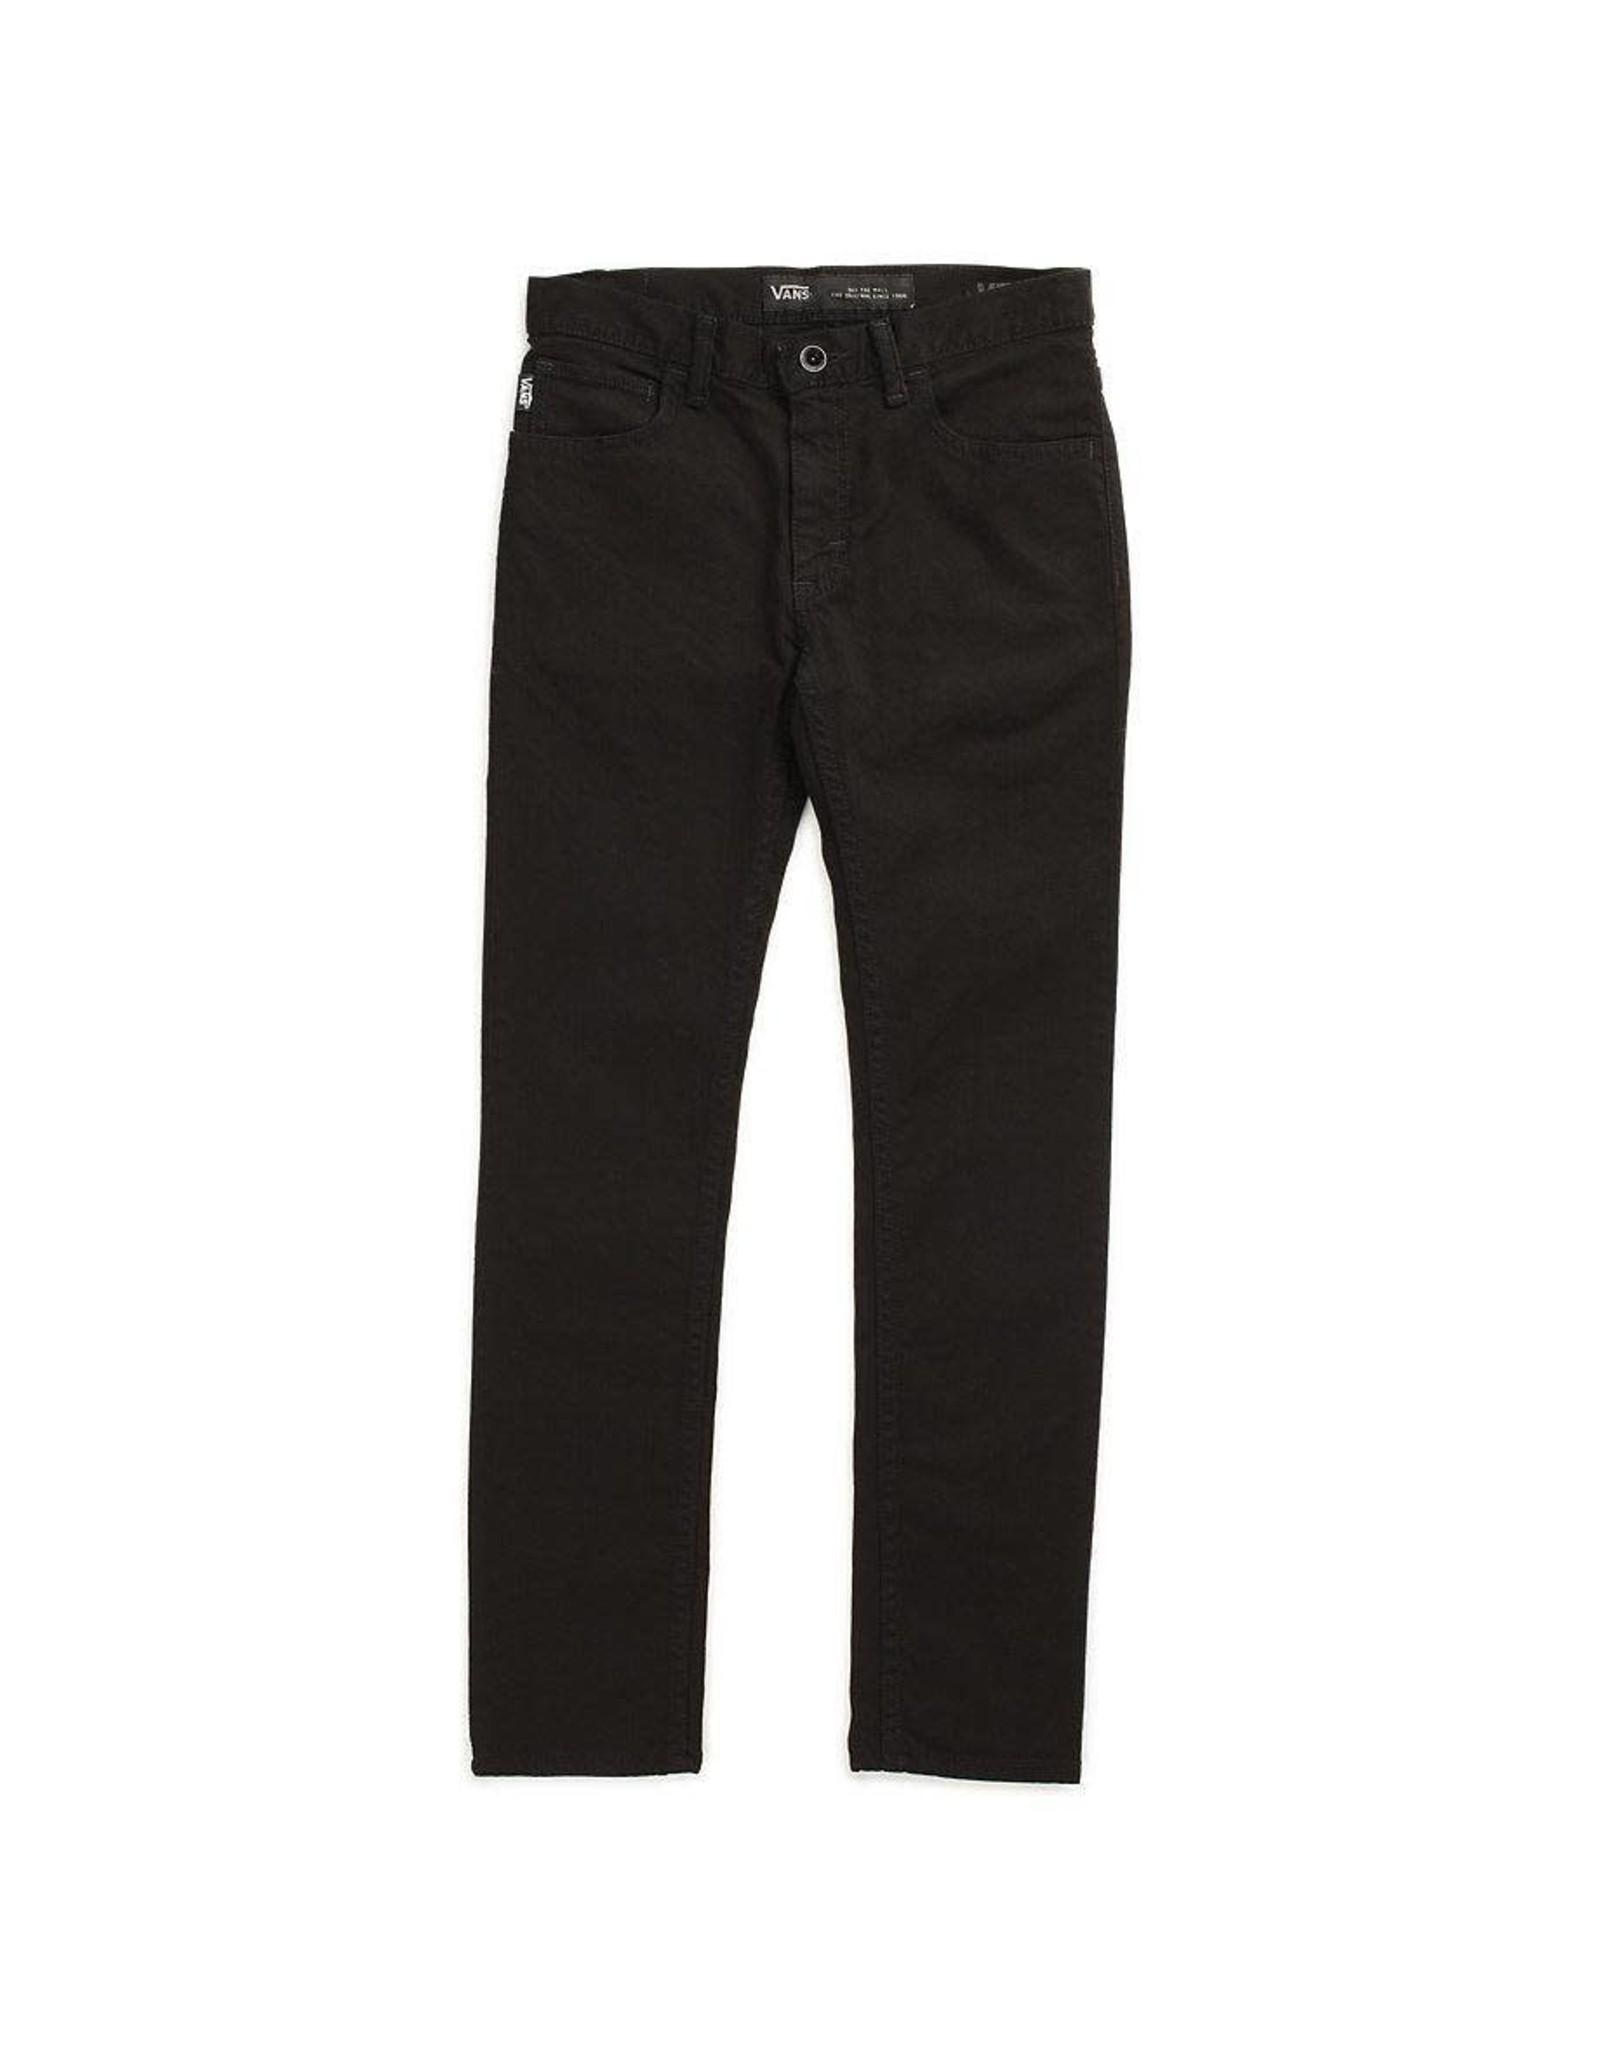 vans Vans - Jeans junior  V 76 skinny